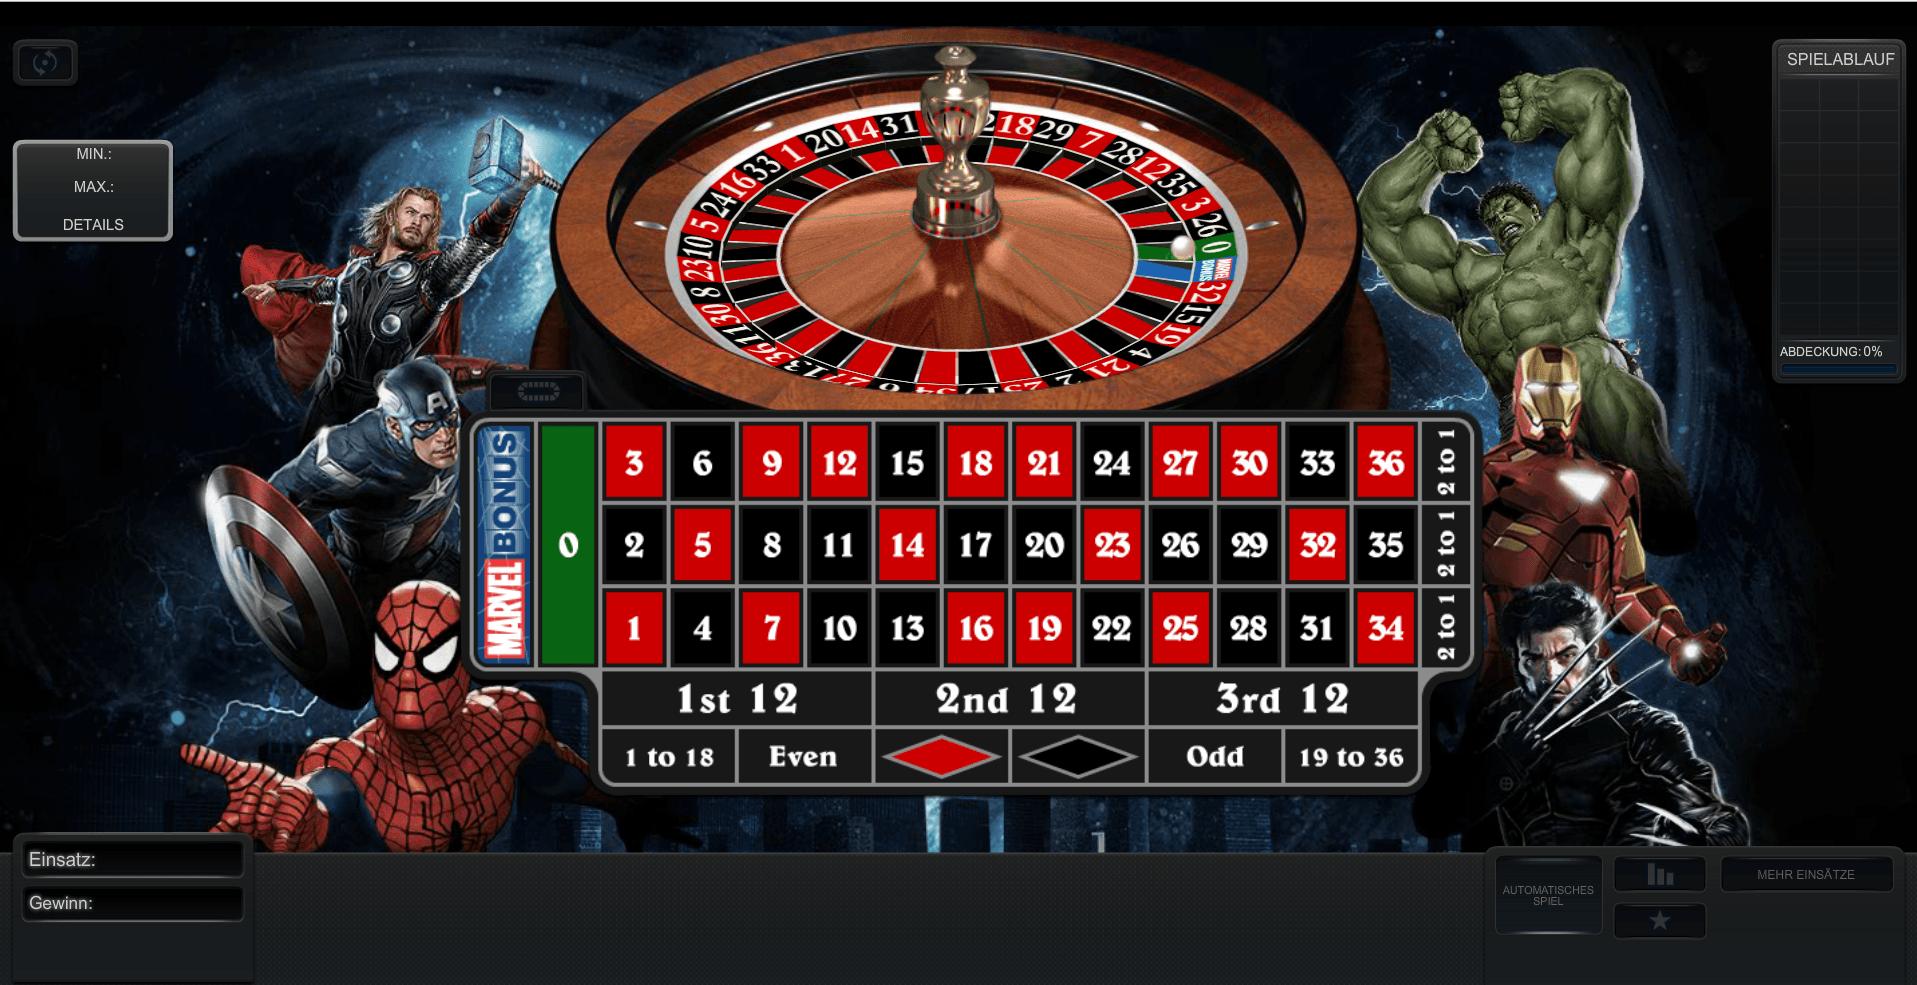 gambling casino online bonus staatliche casinos deutschland